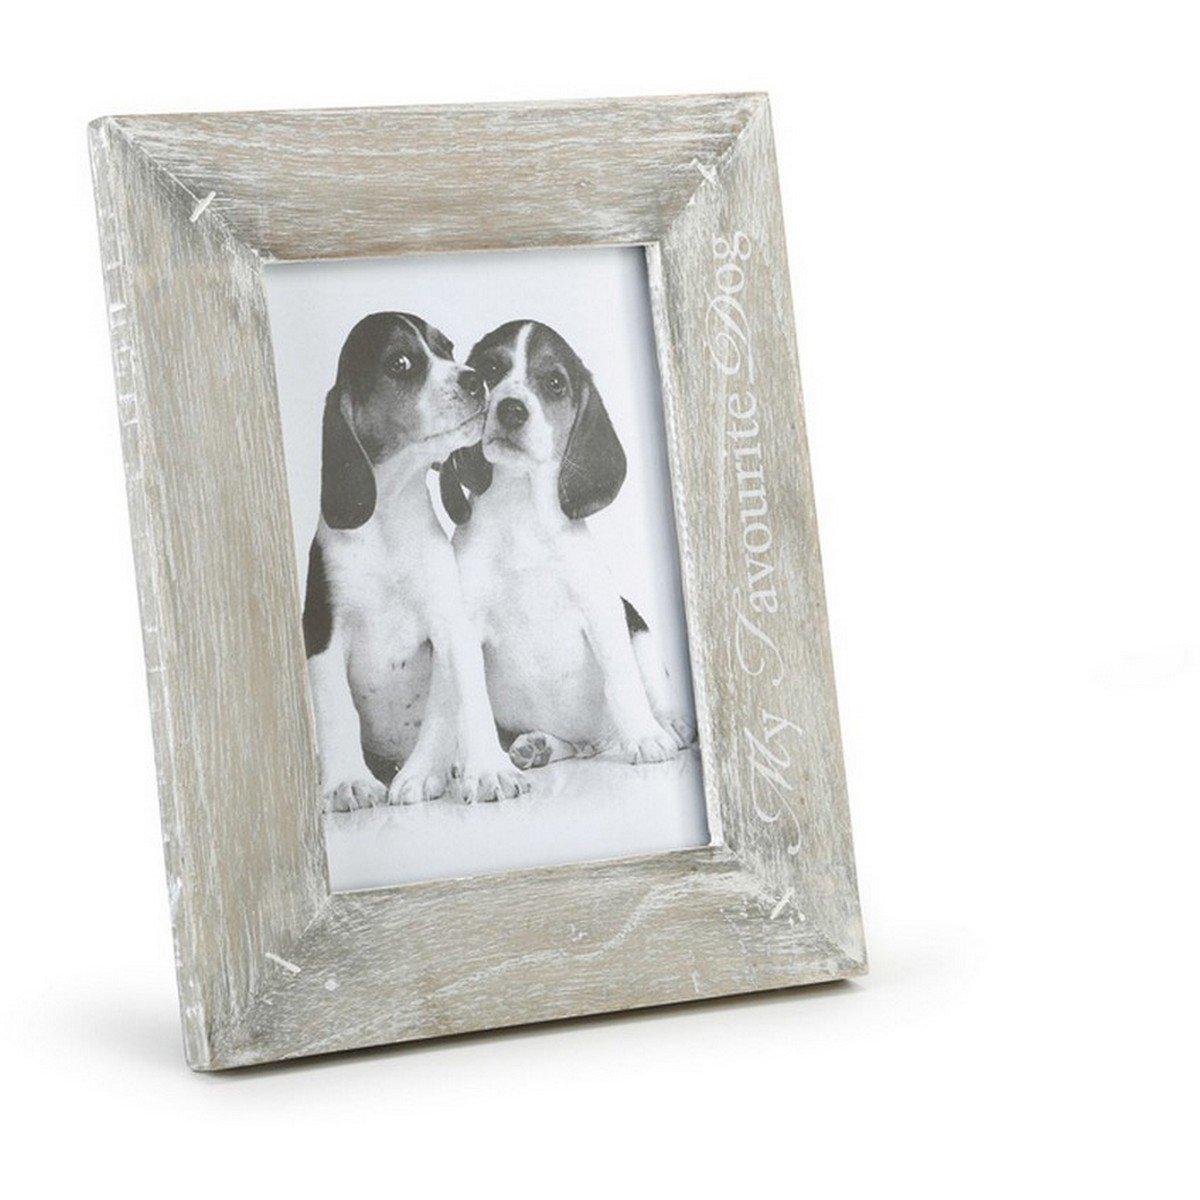 Afbeelding van Designed By Lotte Fotolijst Hond 26x15x26cm